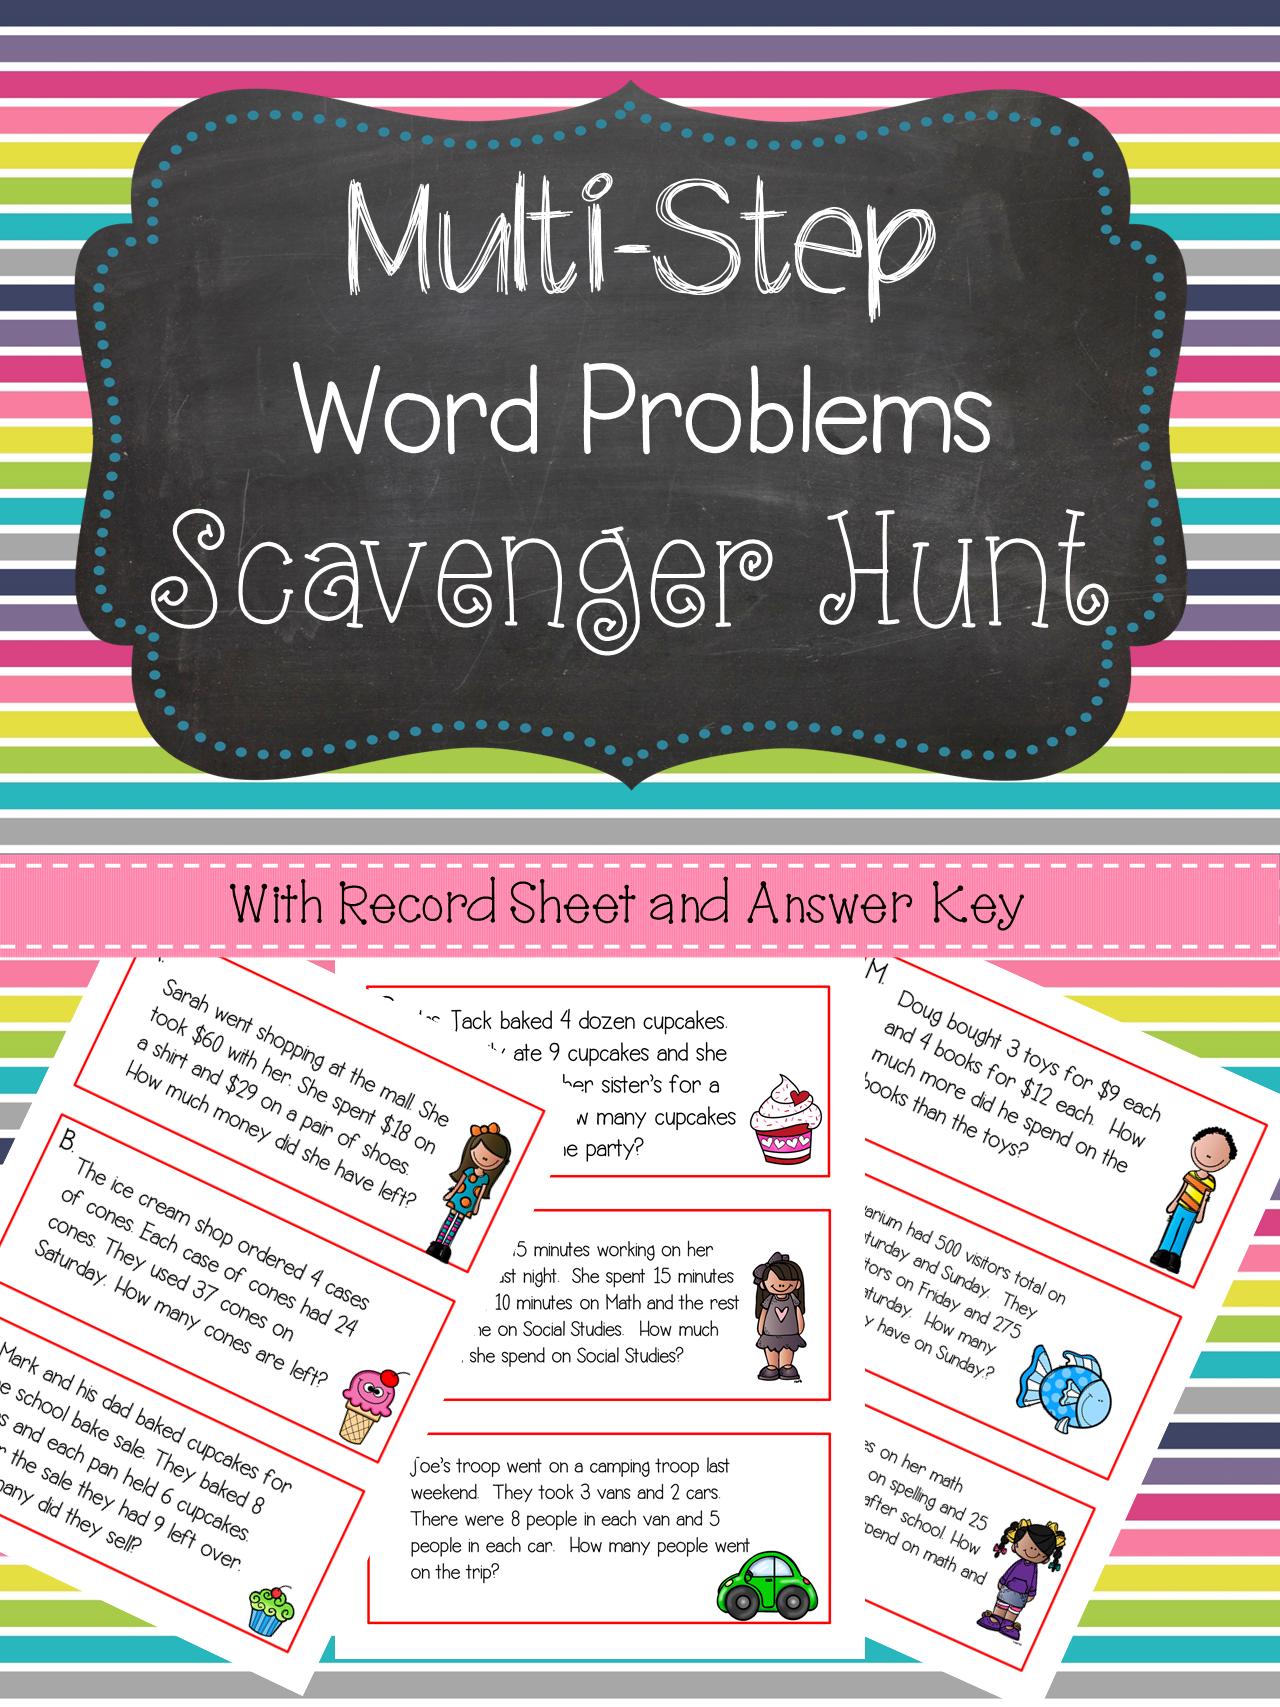 Multi Step Word Problems Scavenger Hunt